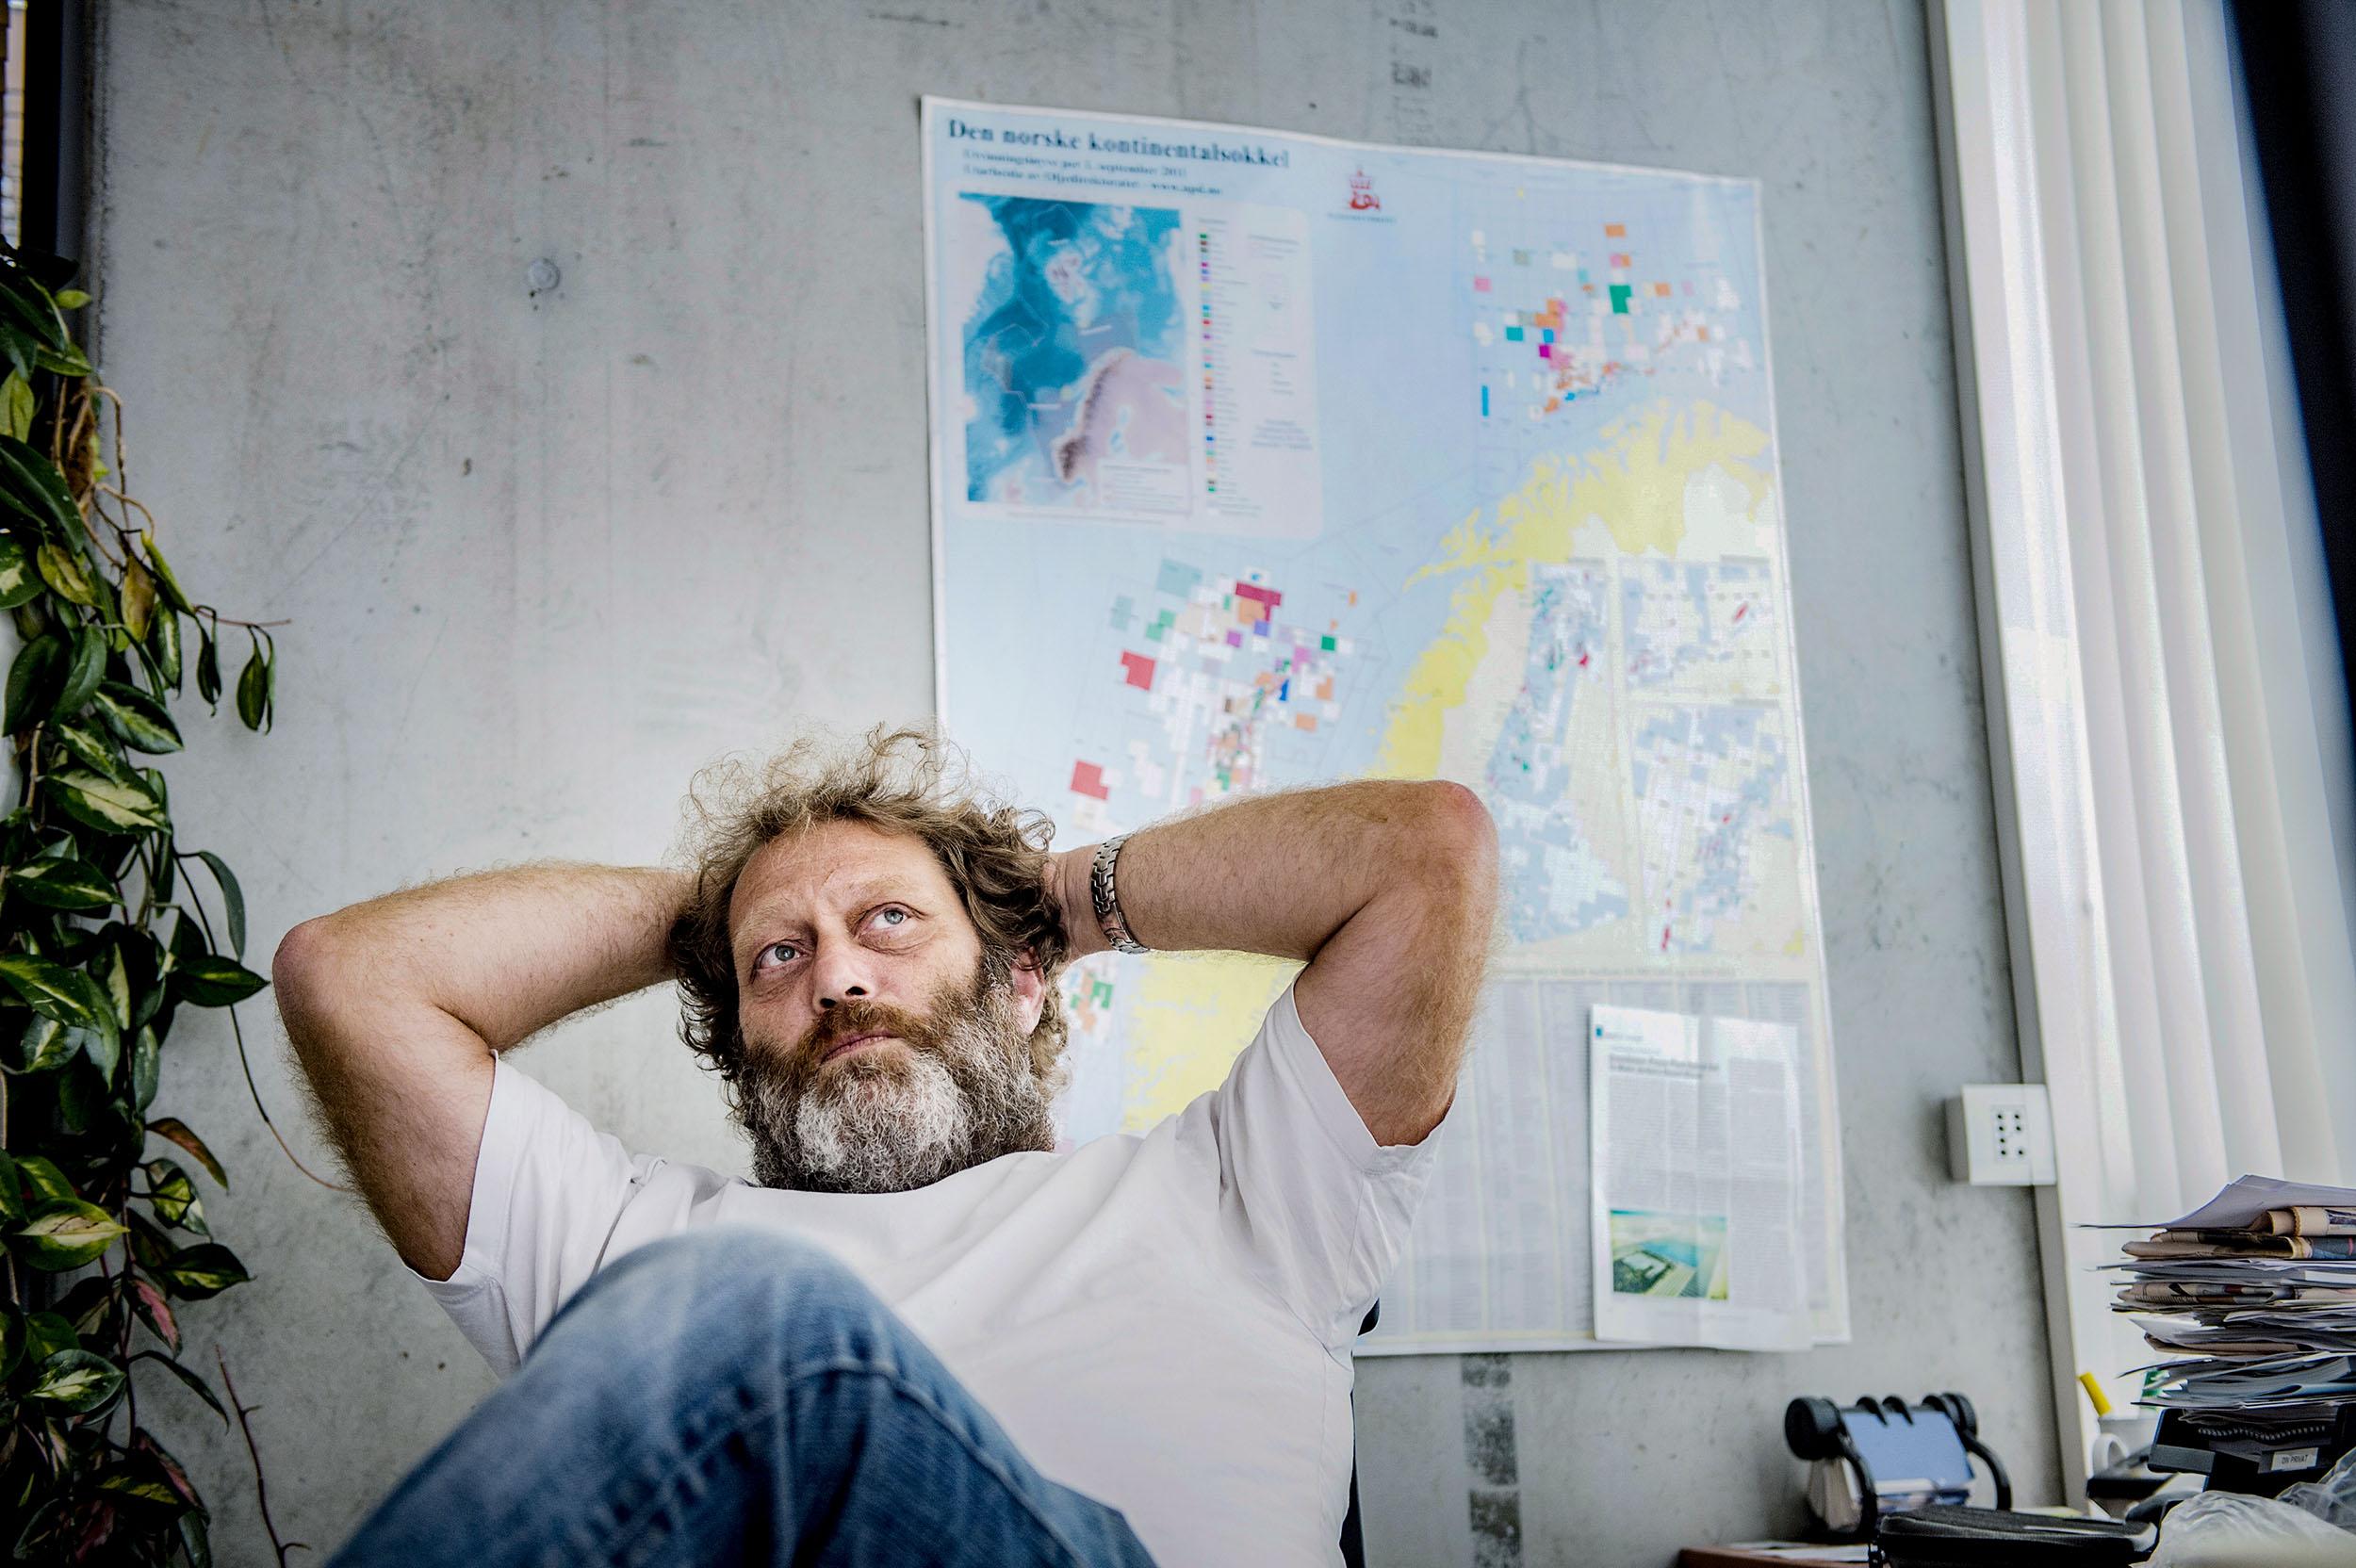 Frederic Hauge